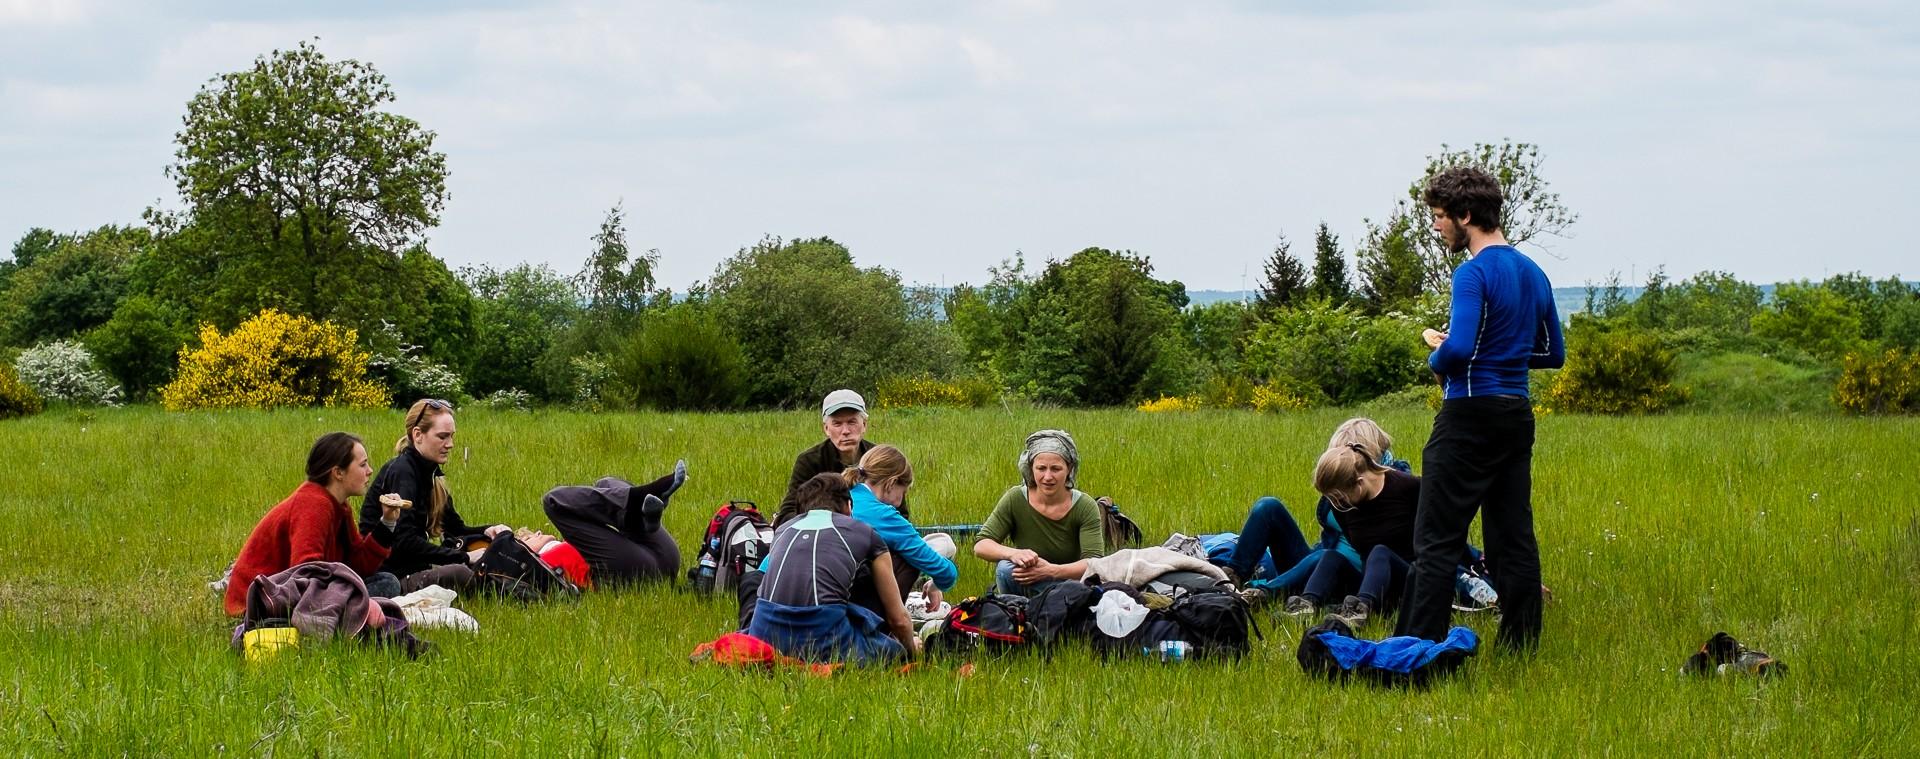 Gruppencoaching in der Natur